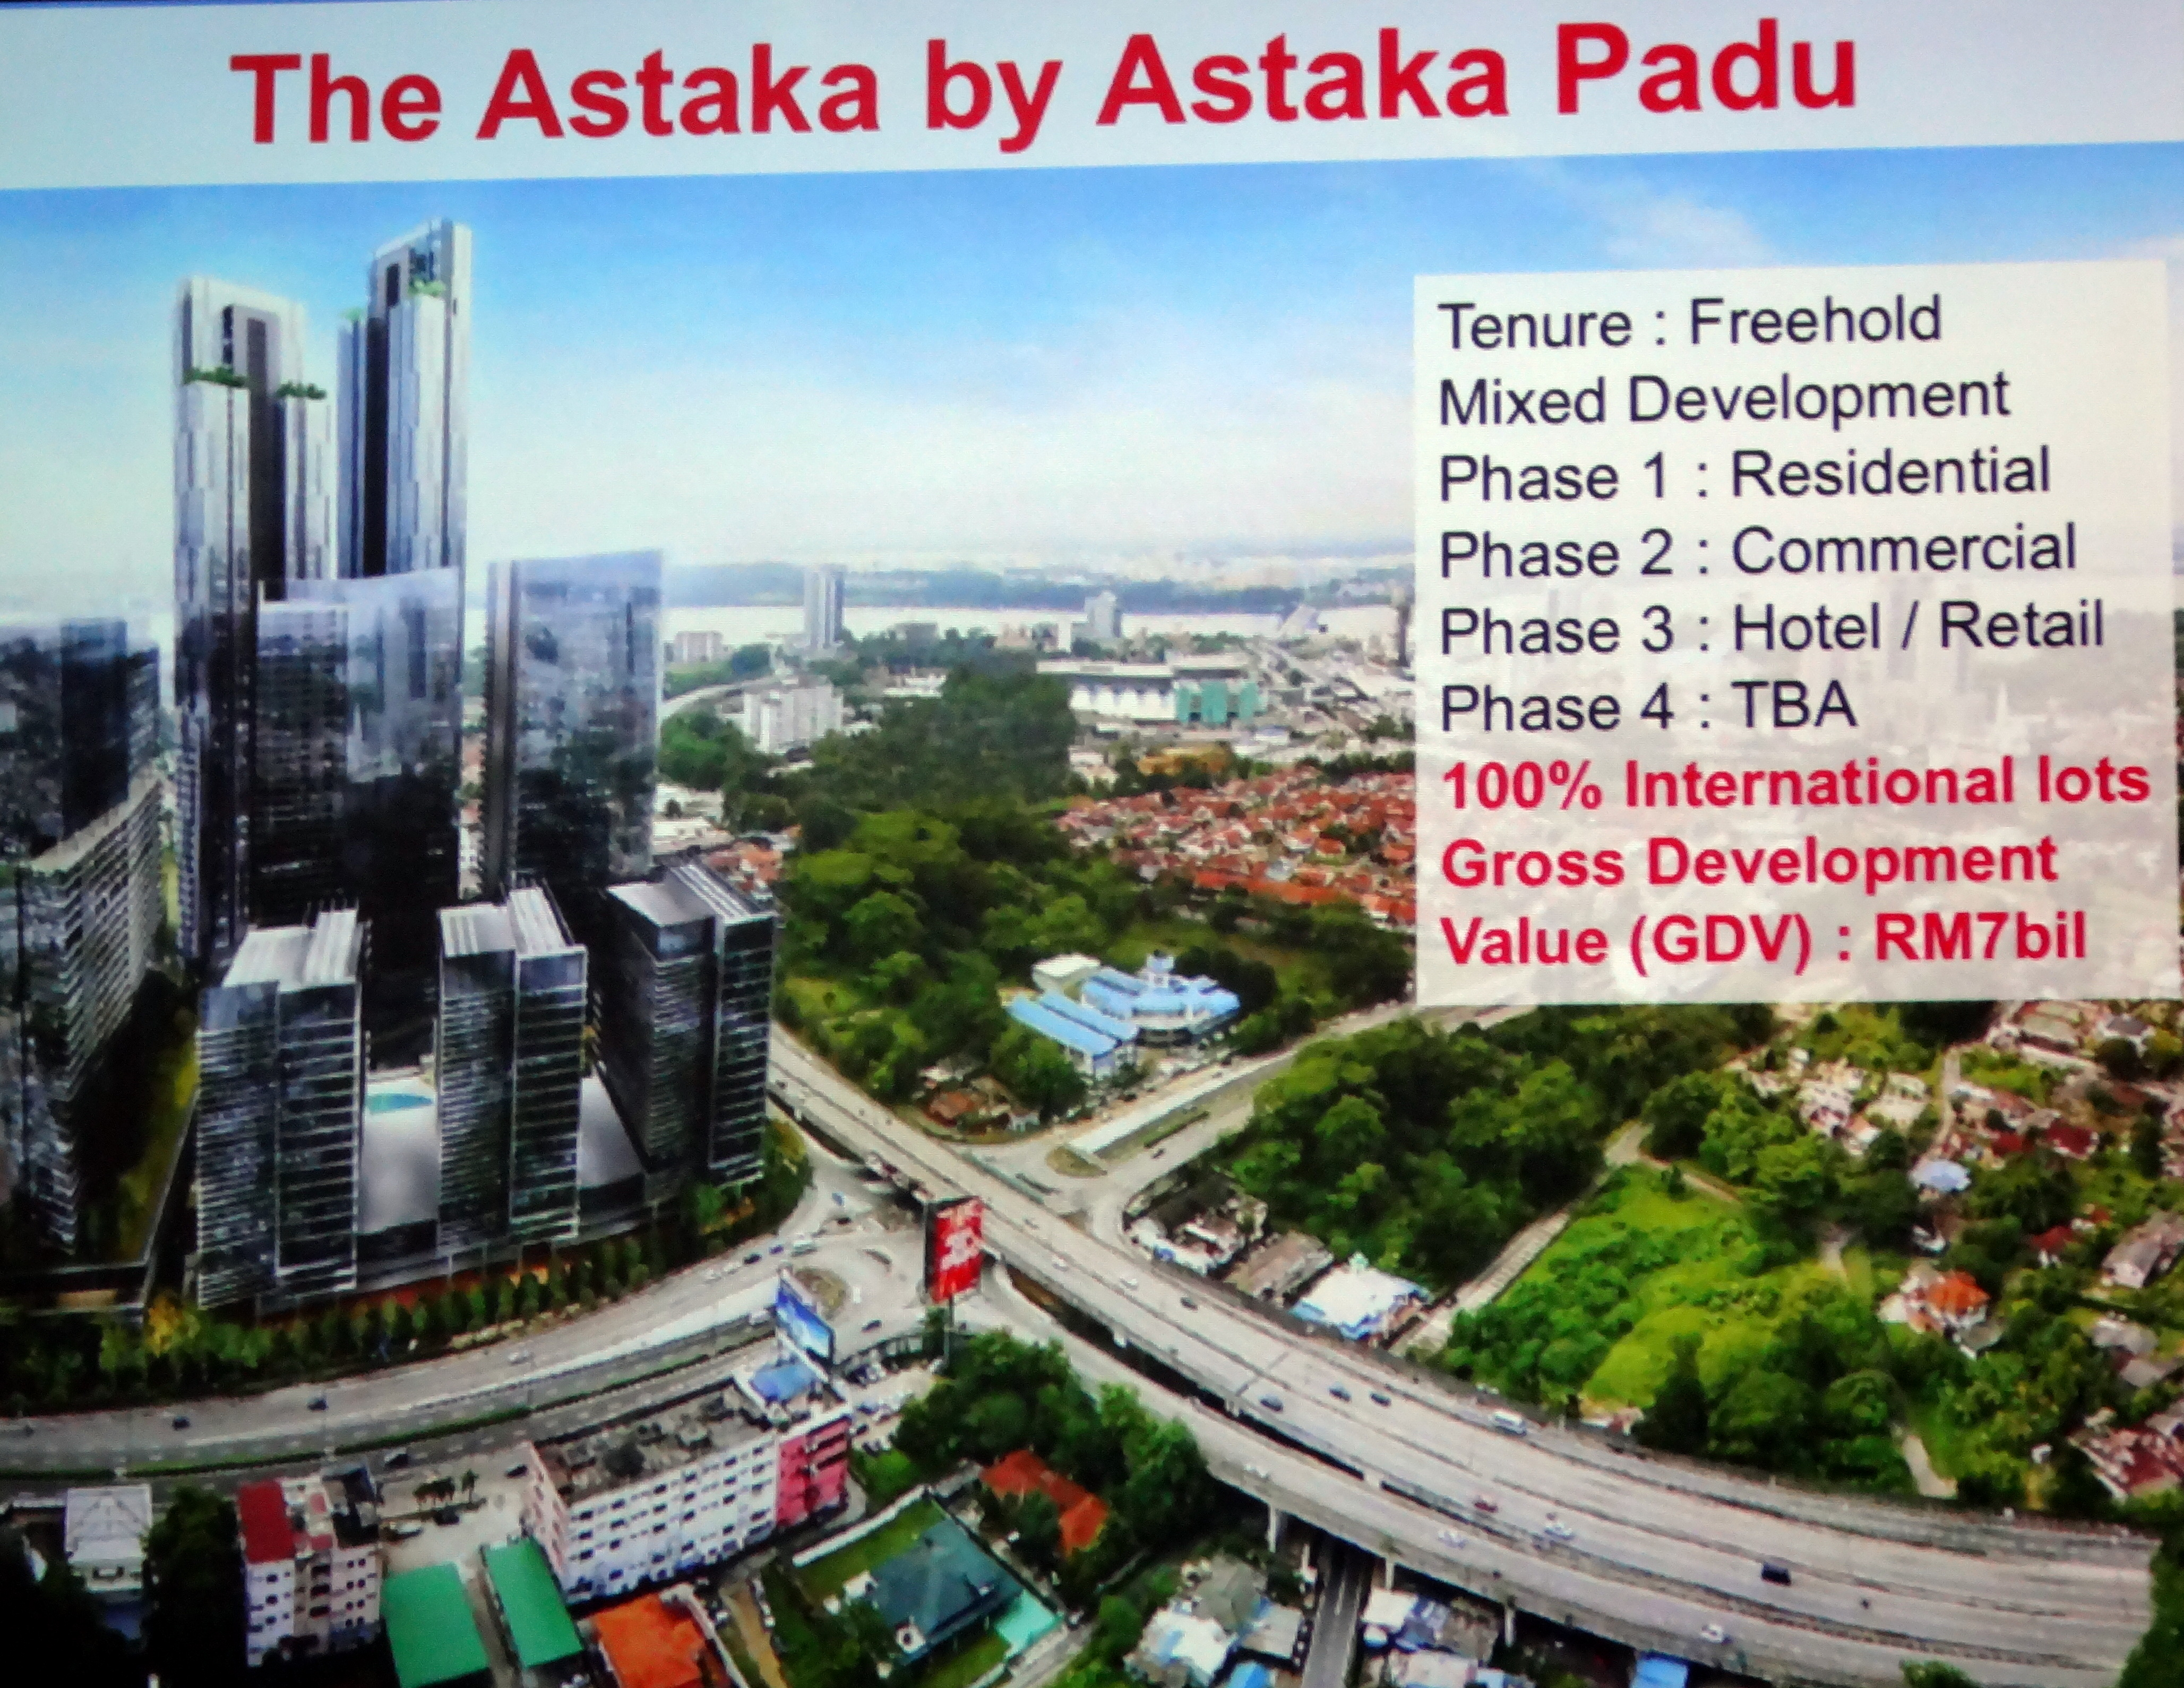 The Astaka by AstakaPadu